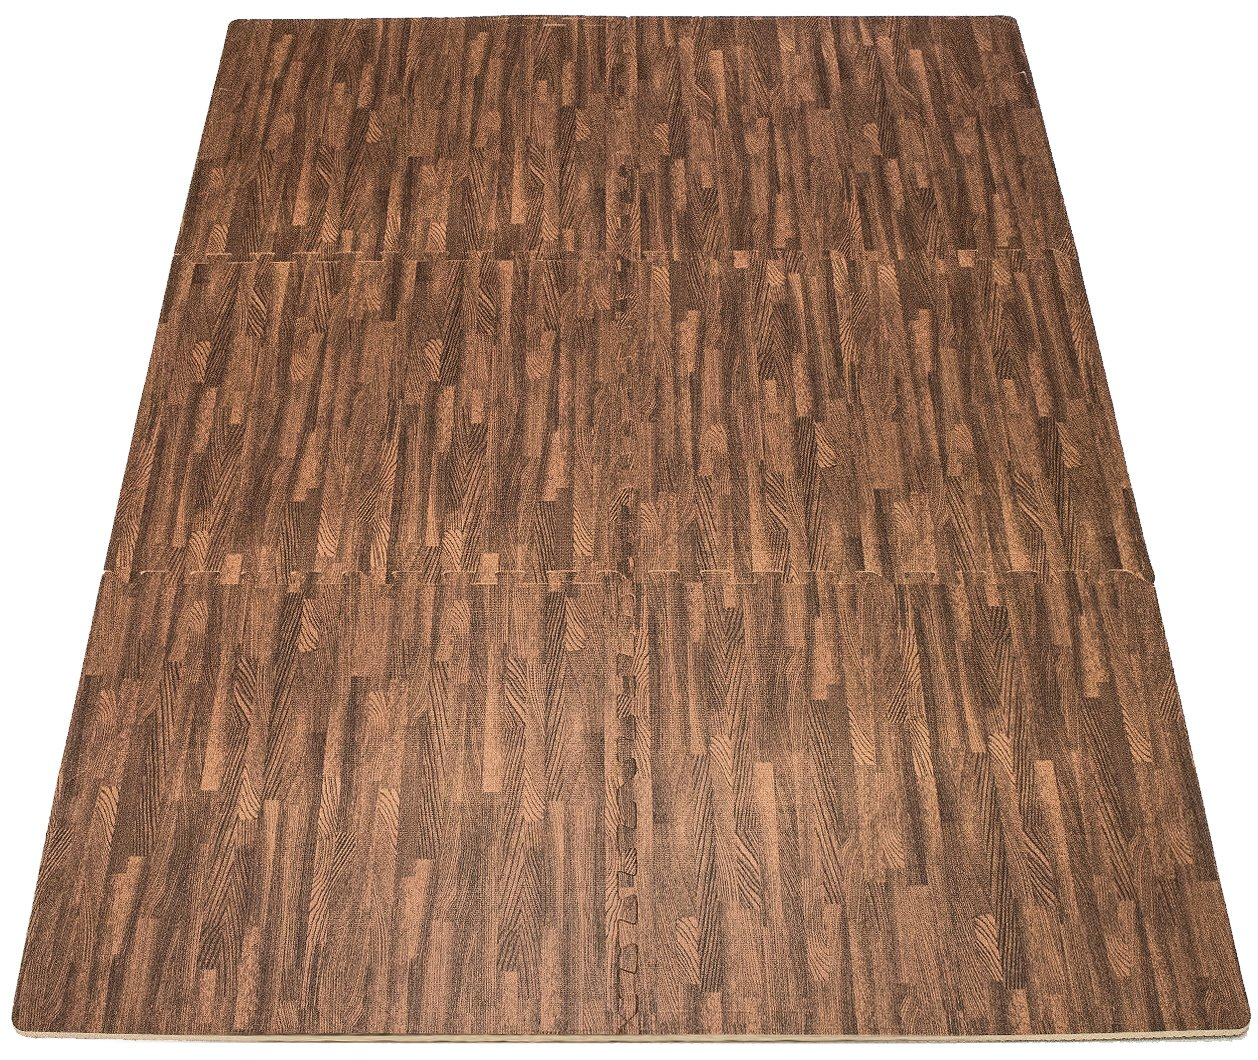 Sorbus Interlocking Floor Mat Print, Wood Grain - Dark (6-Piece) by Sorbus (Image #6)